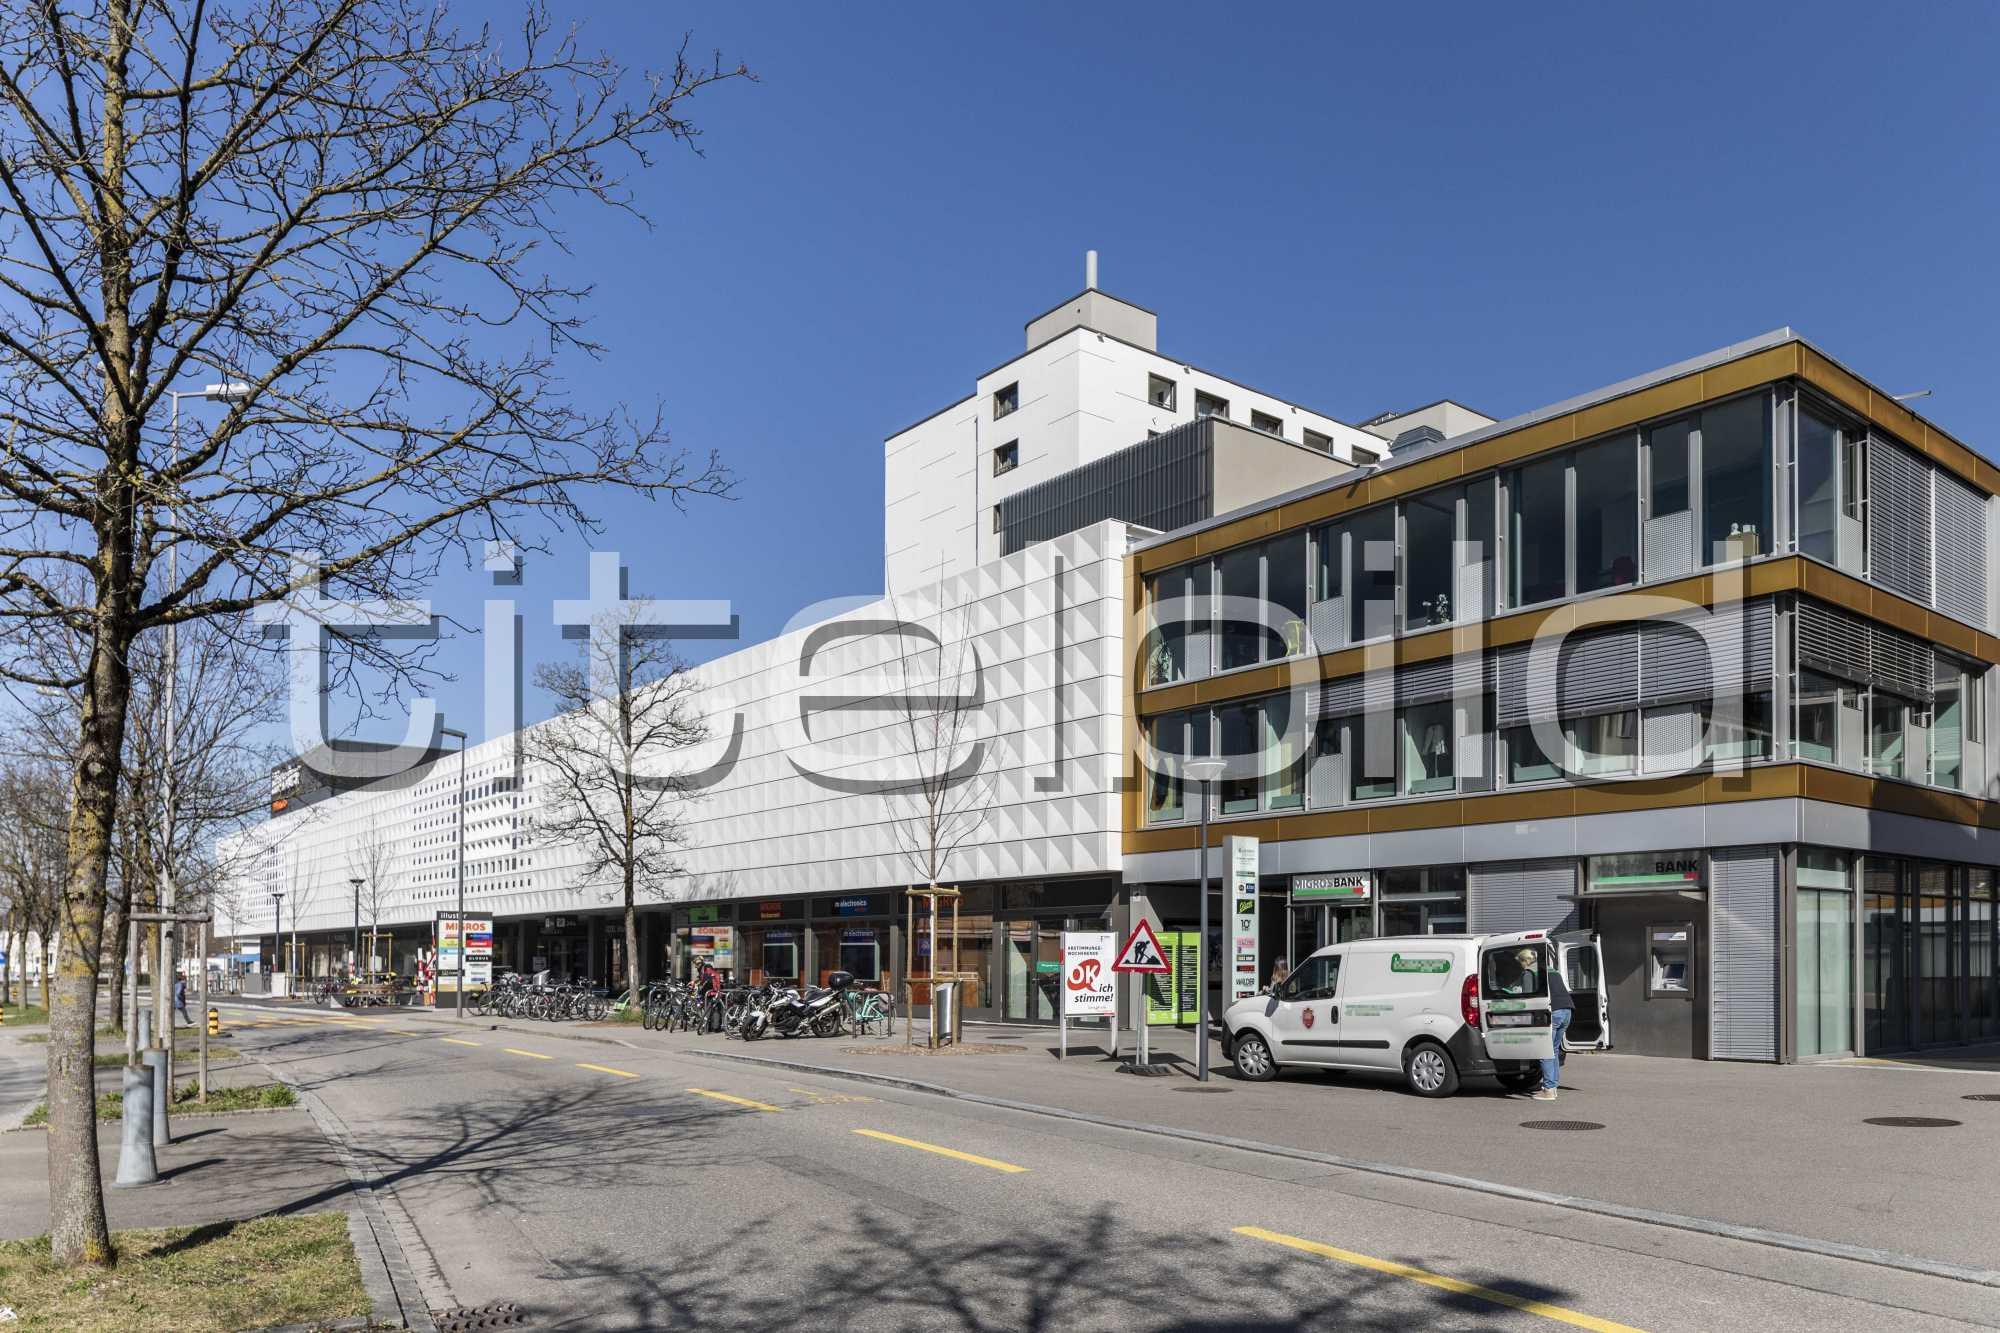 Projektbild-Nr. 1: Illuster Umbau Einkaufszentrum